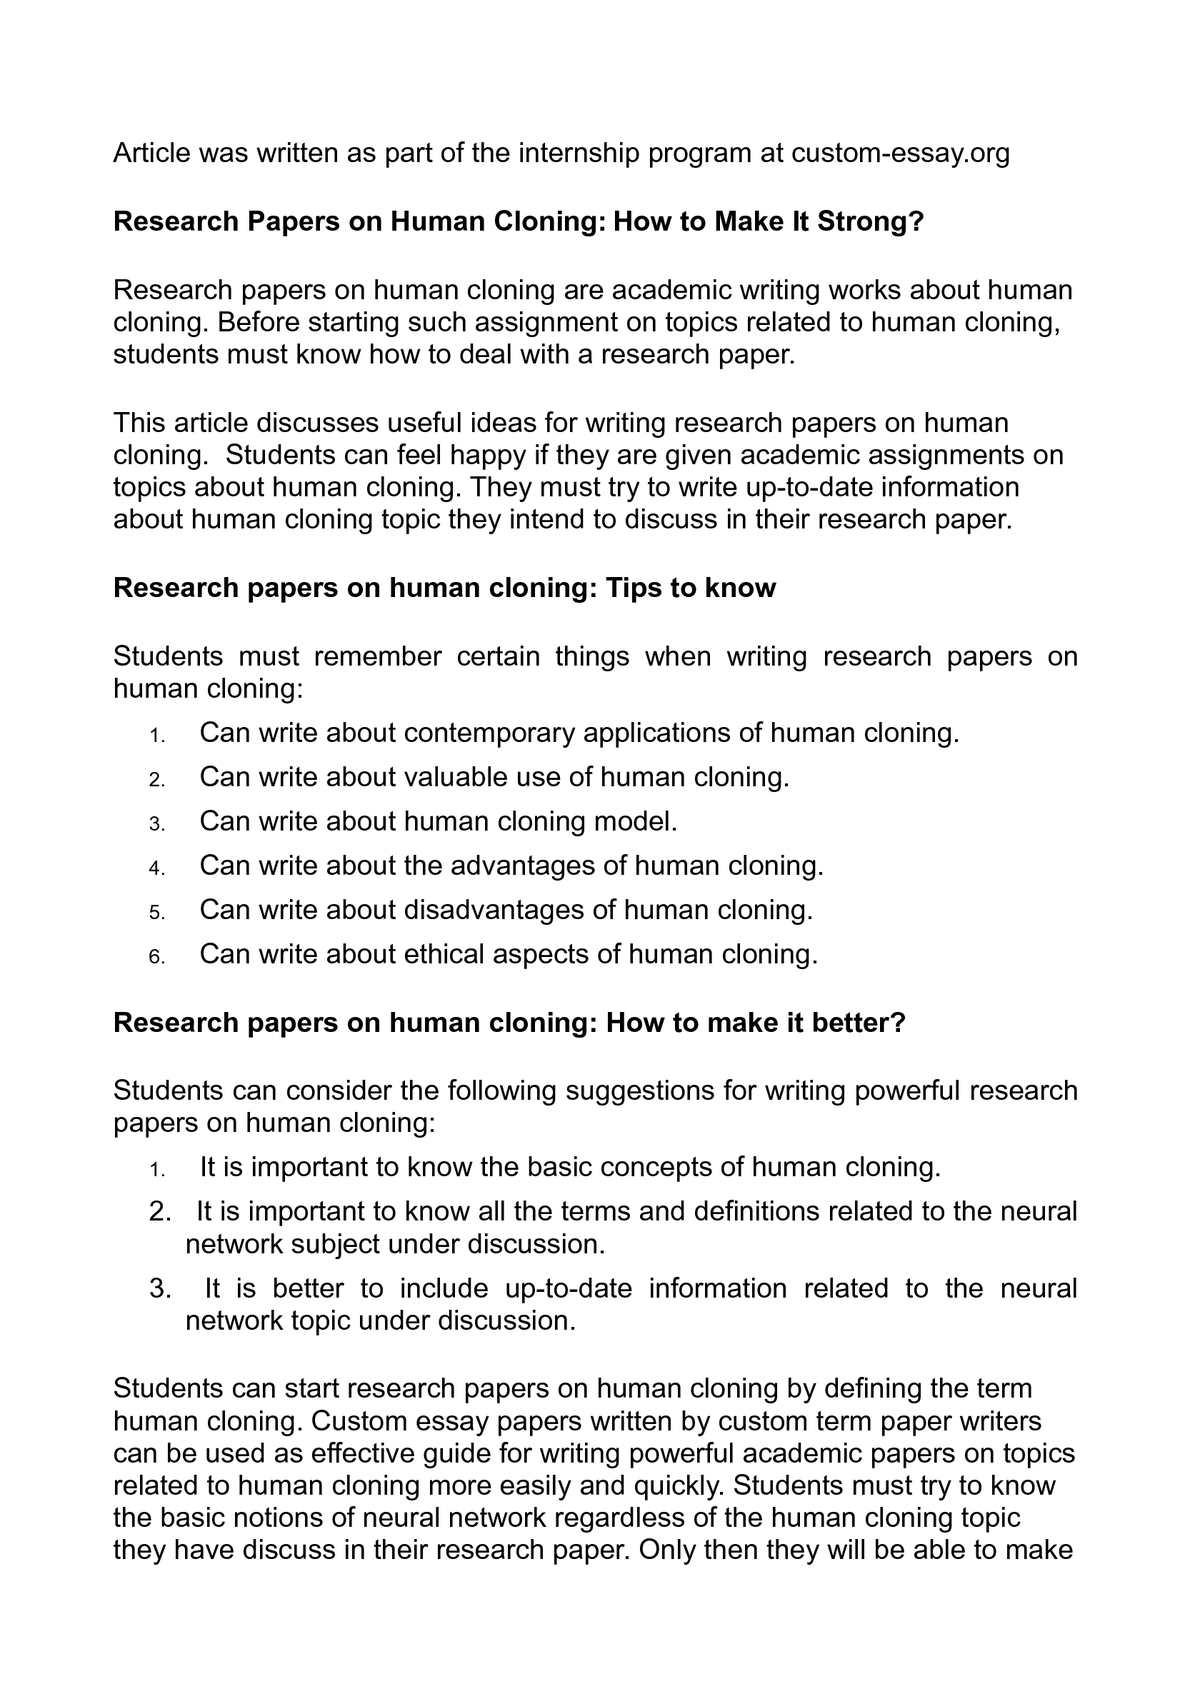 human cloning articles pdf